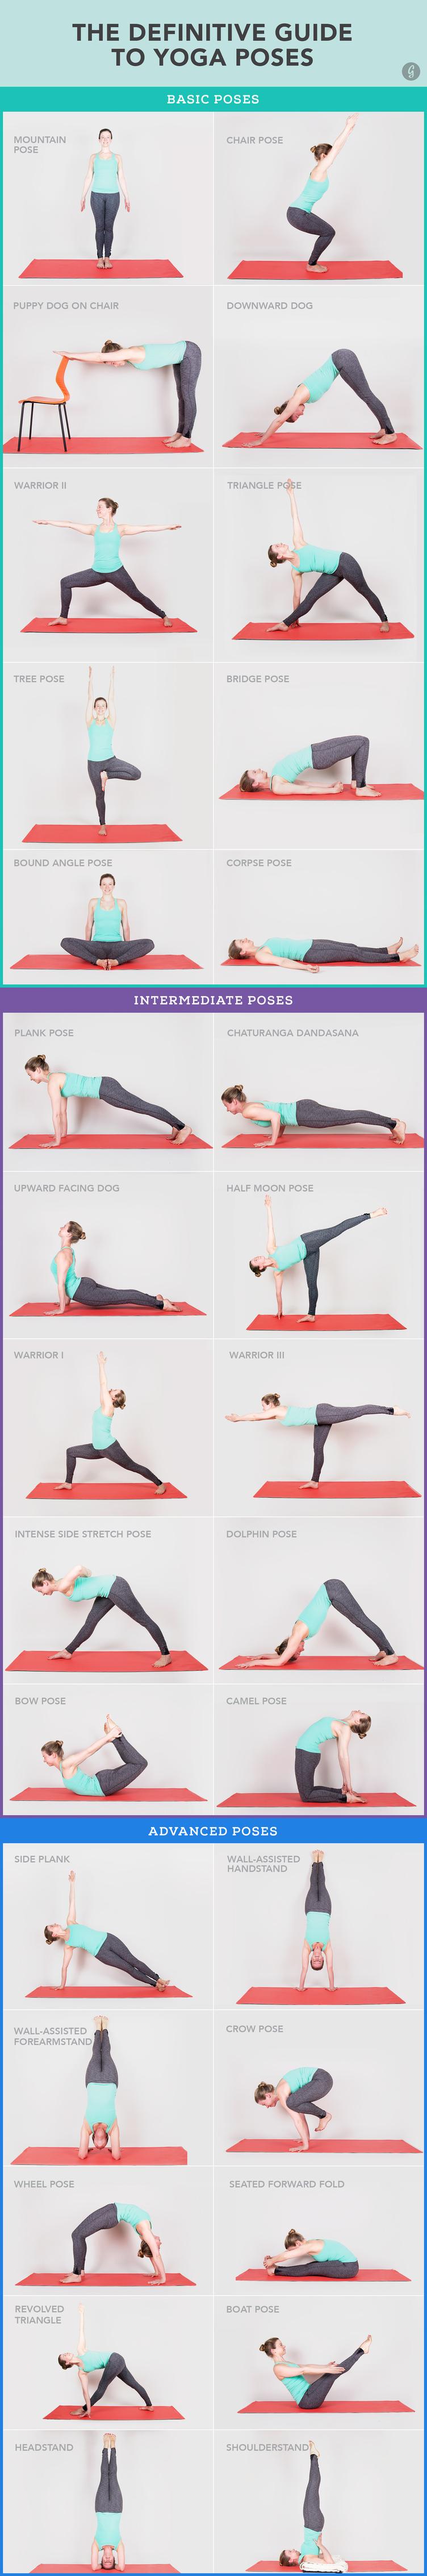 yoga poses greatist 2